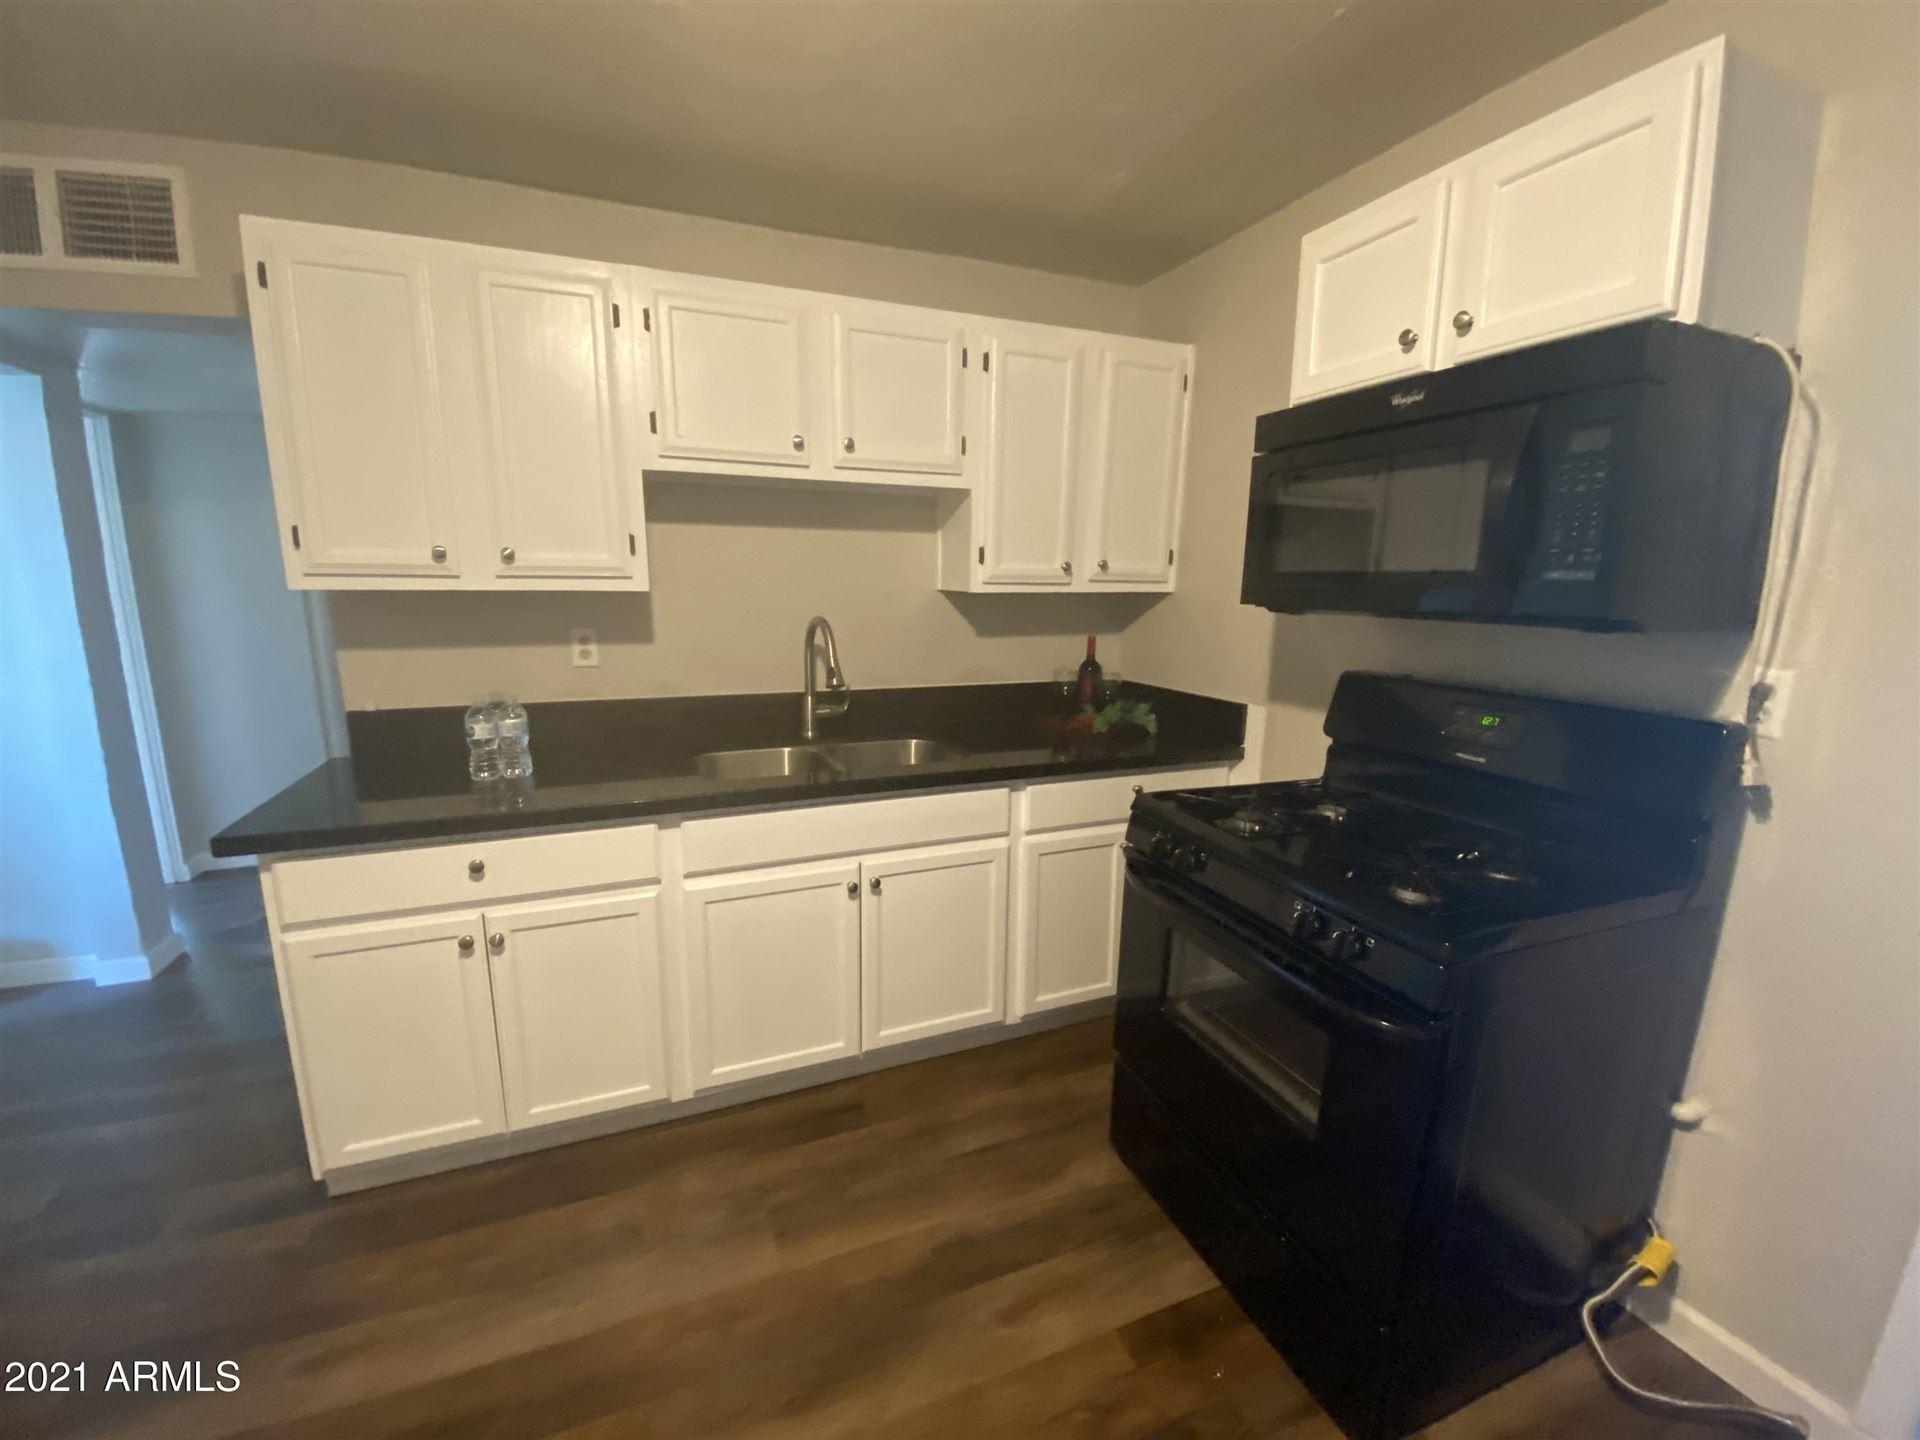 2540 W COOLIDGE Street, Phoenix, AZ 85017 - MLS#: 6231498